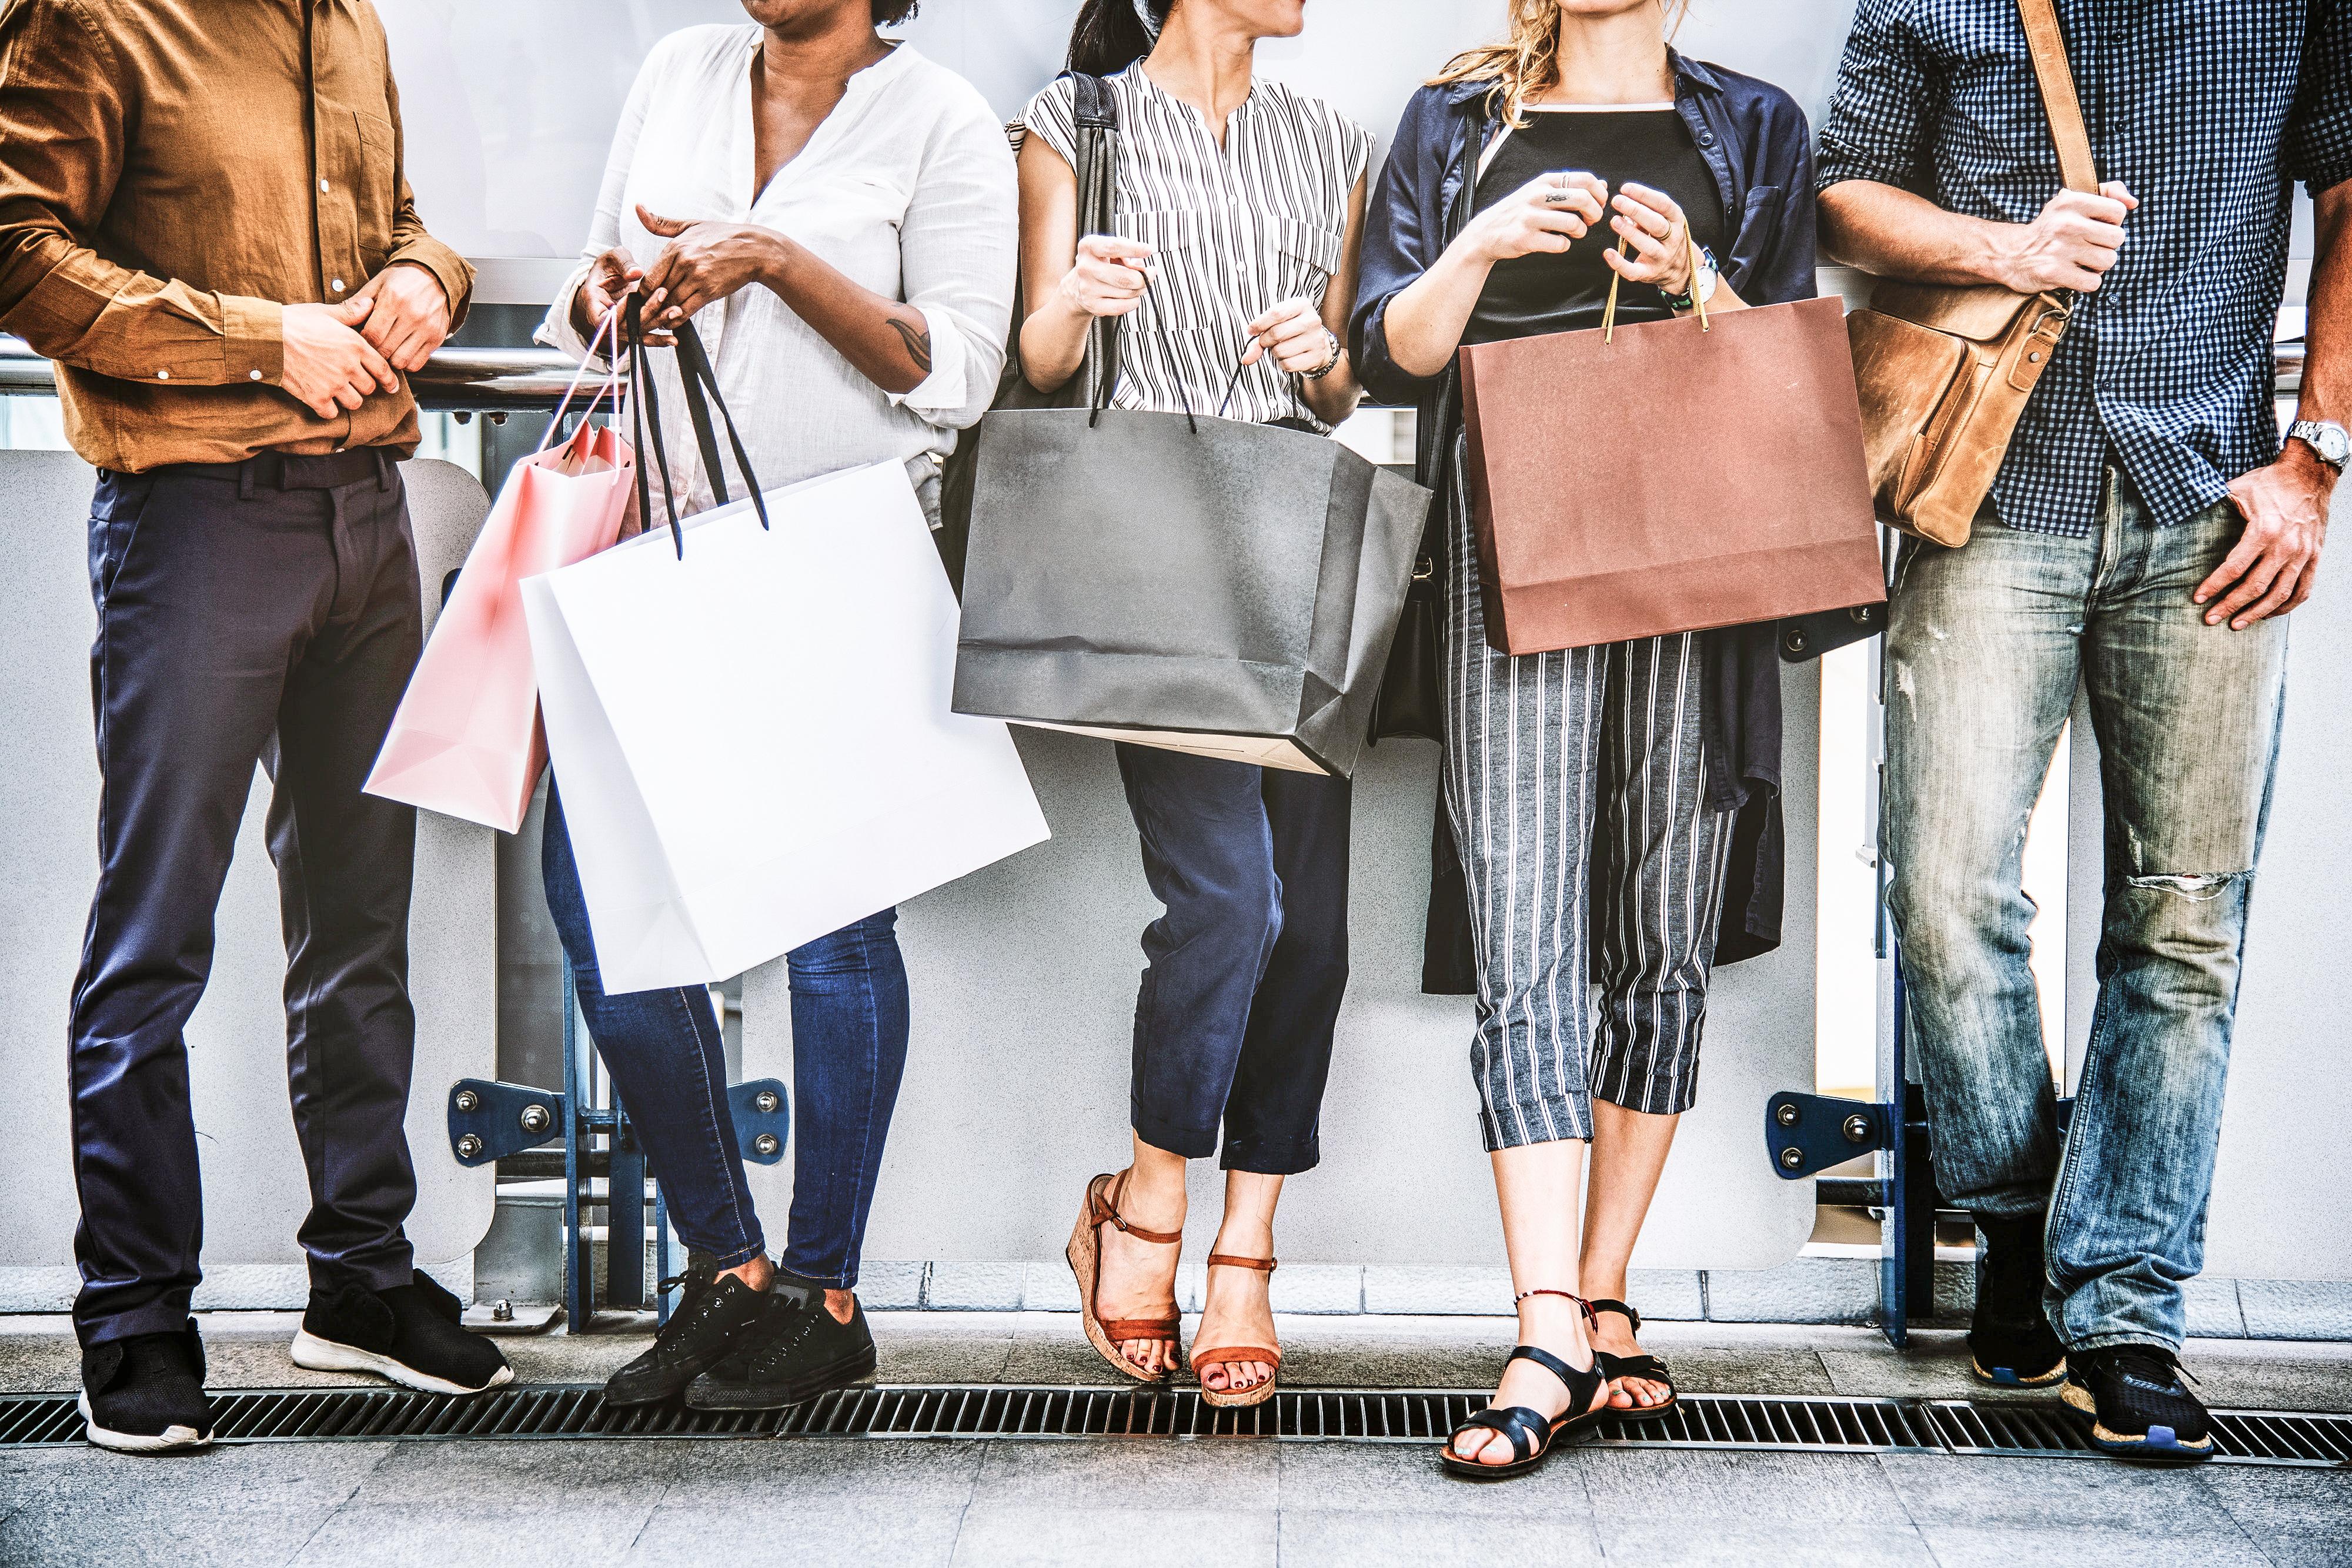 Influencer Marketing and Consumerism